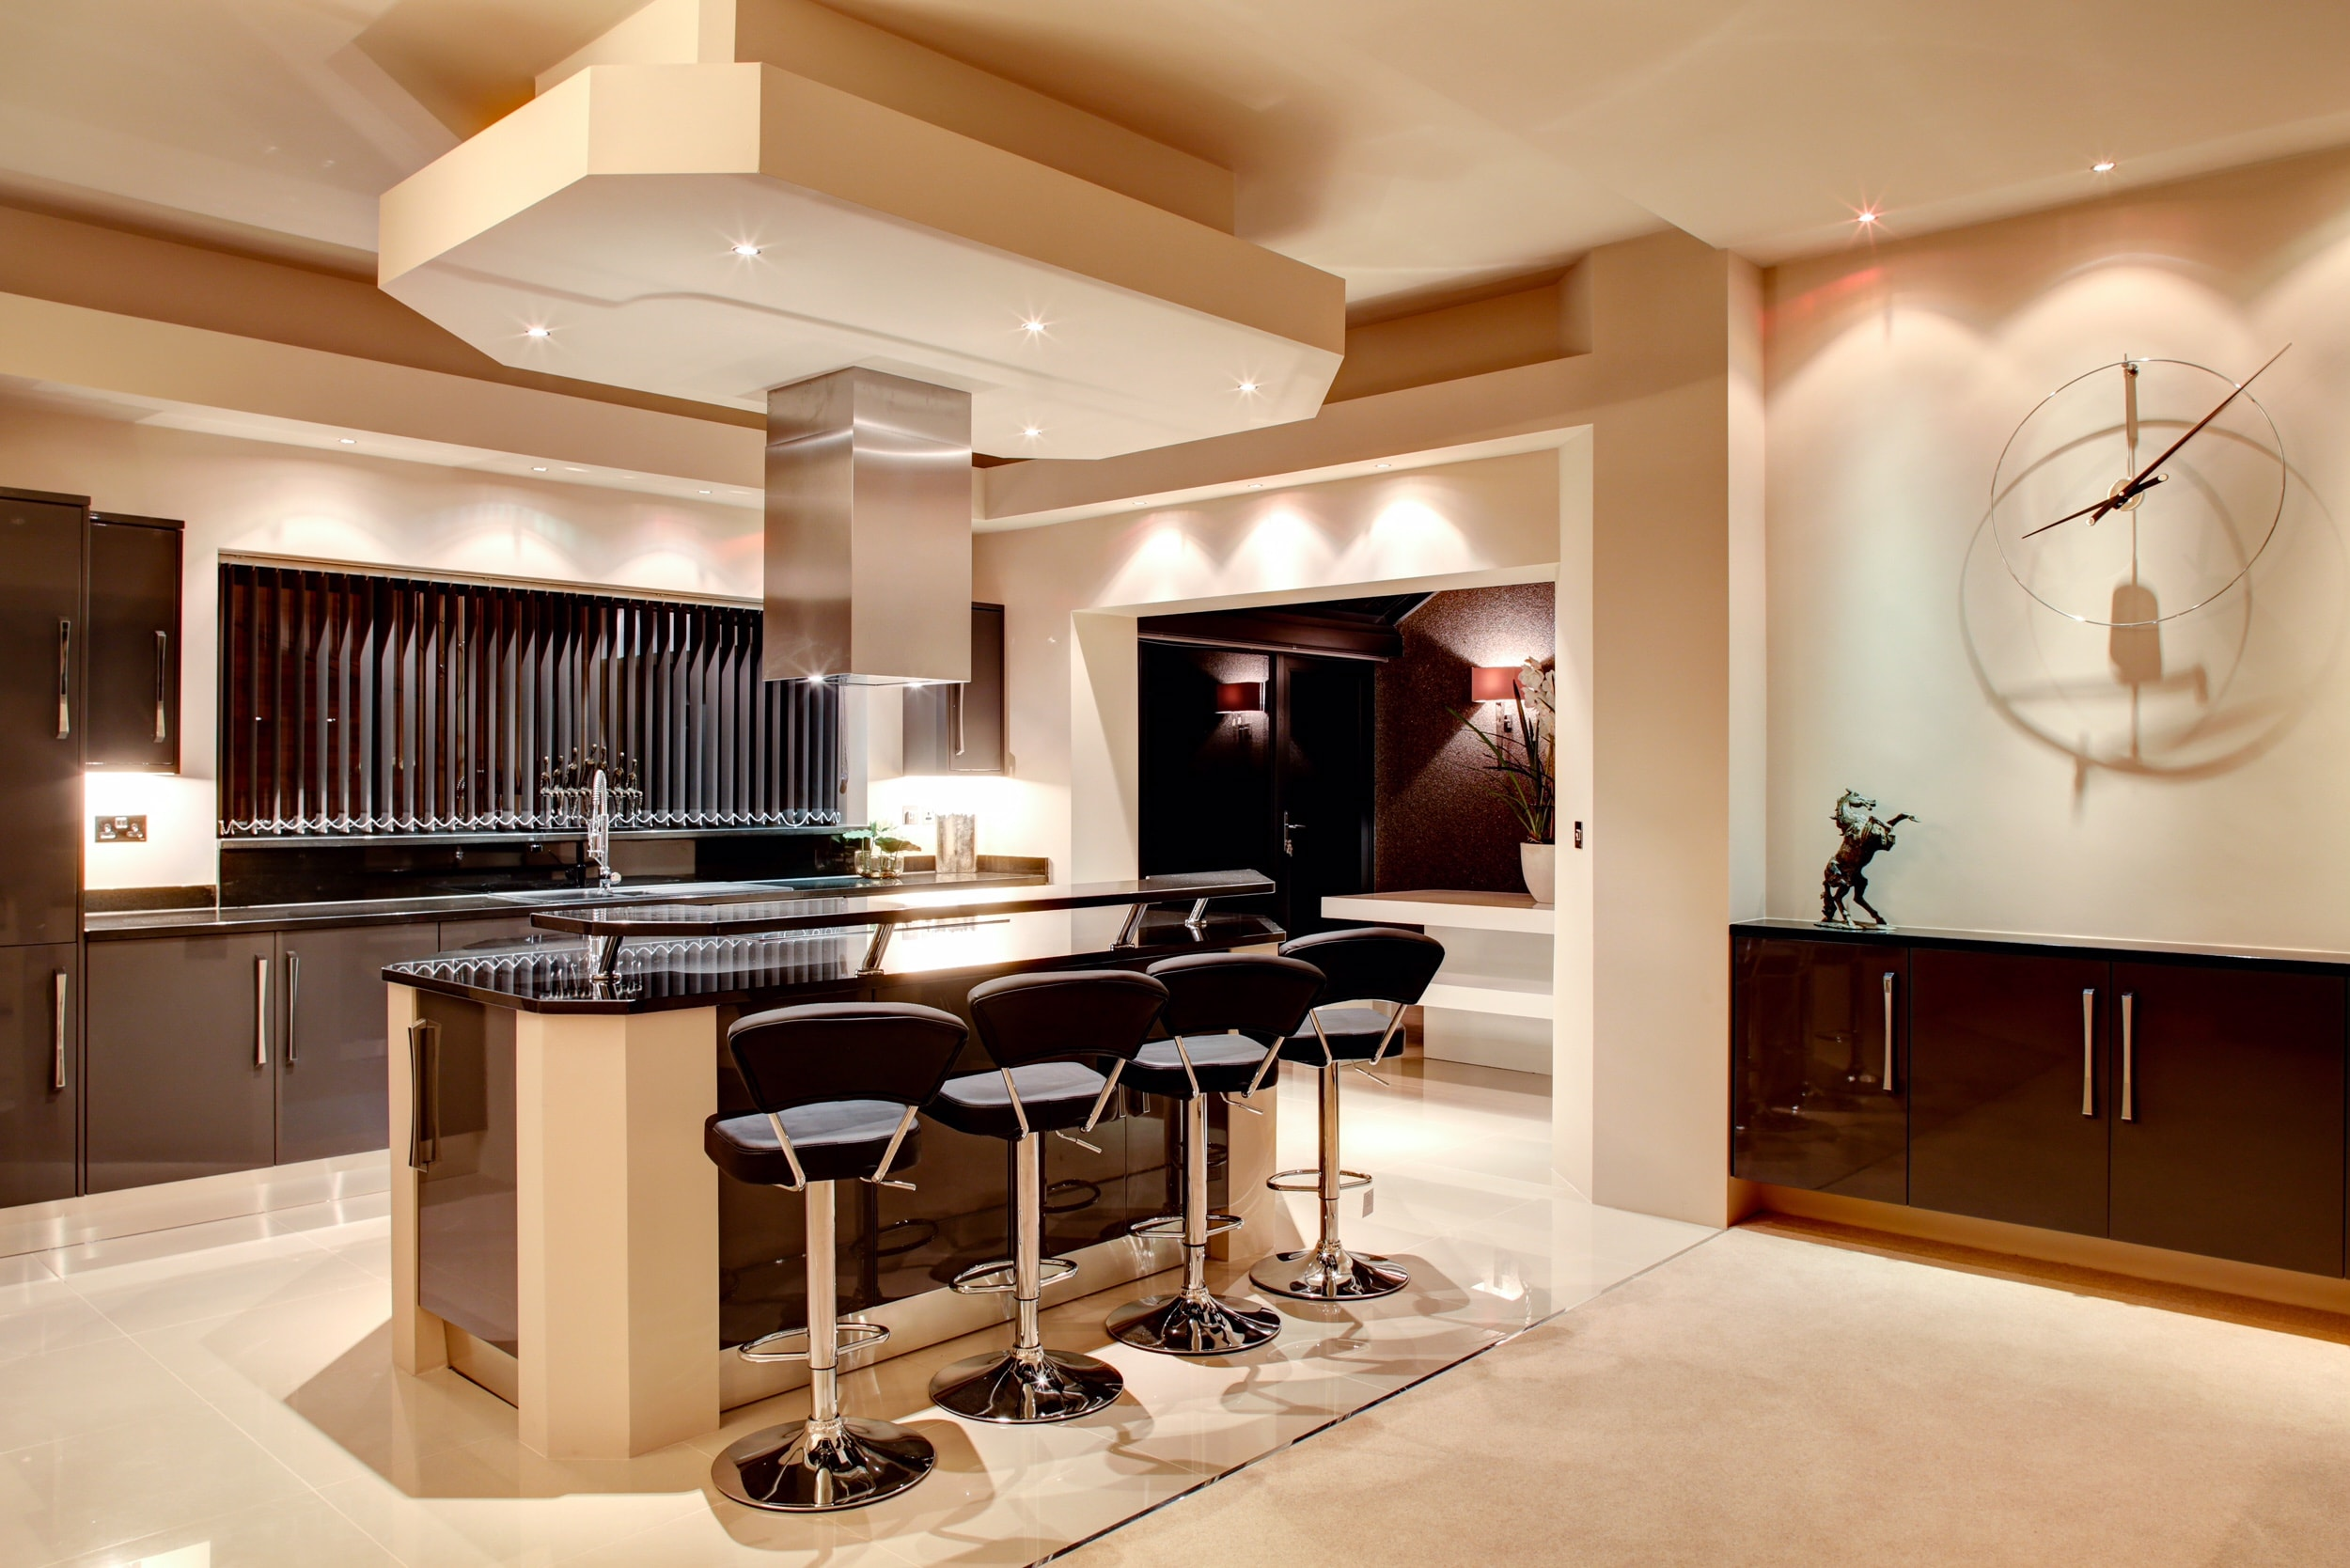 Designer kitchen in Nottingham luxury homes developement by Guy Phoenix